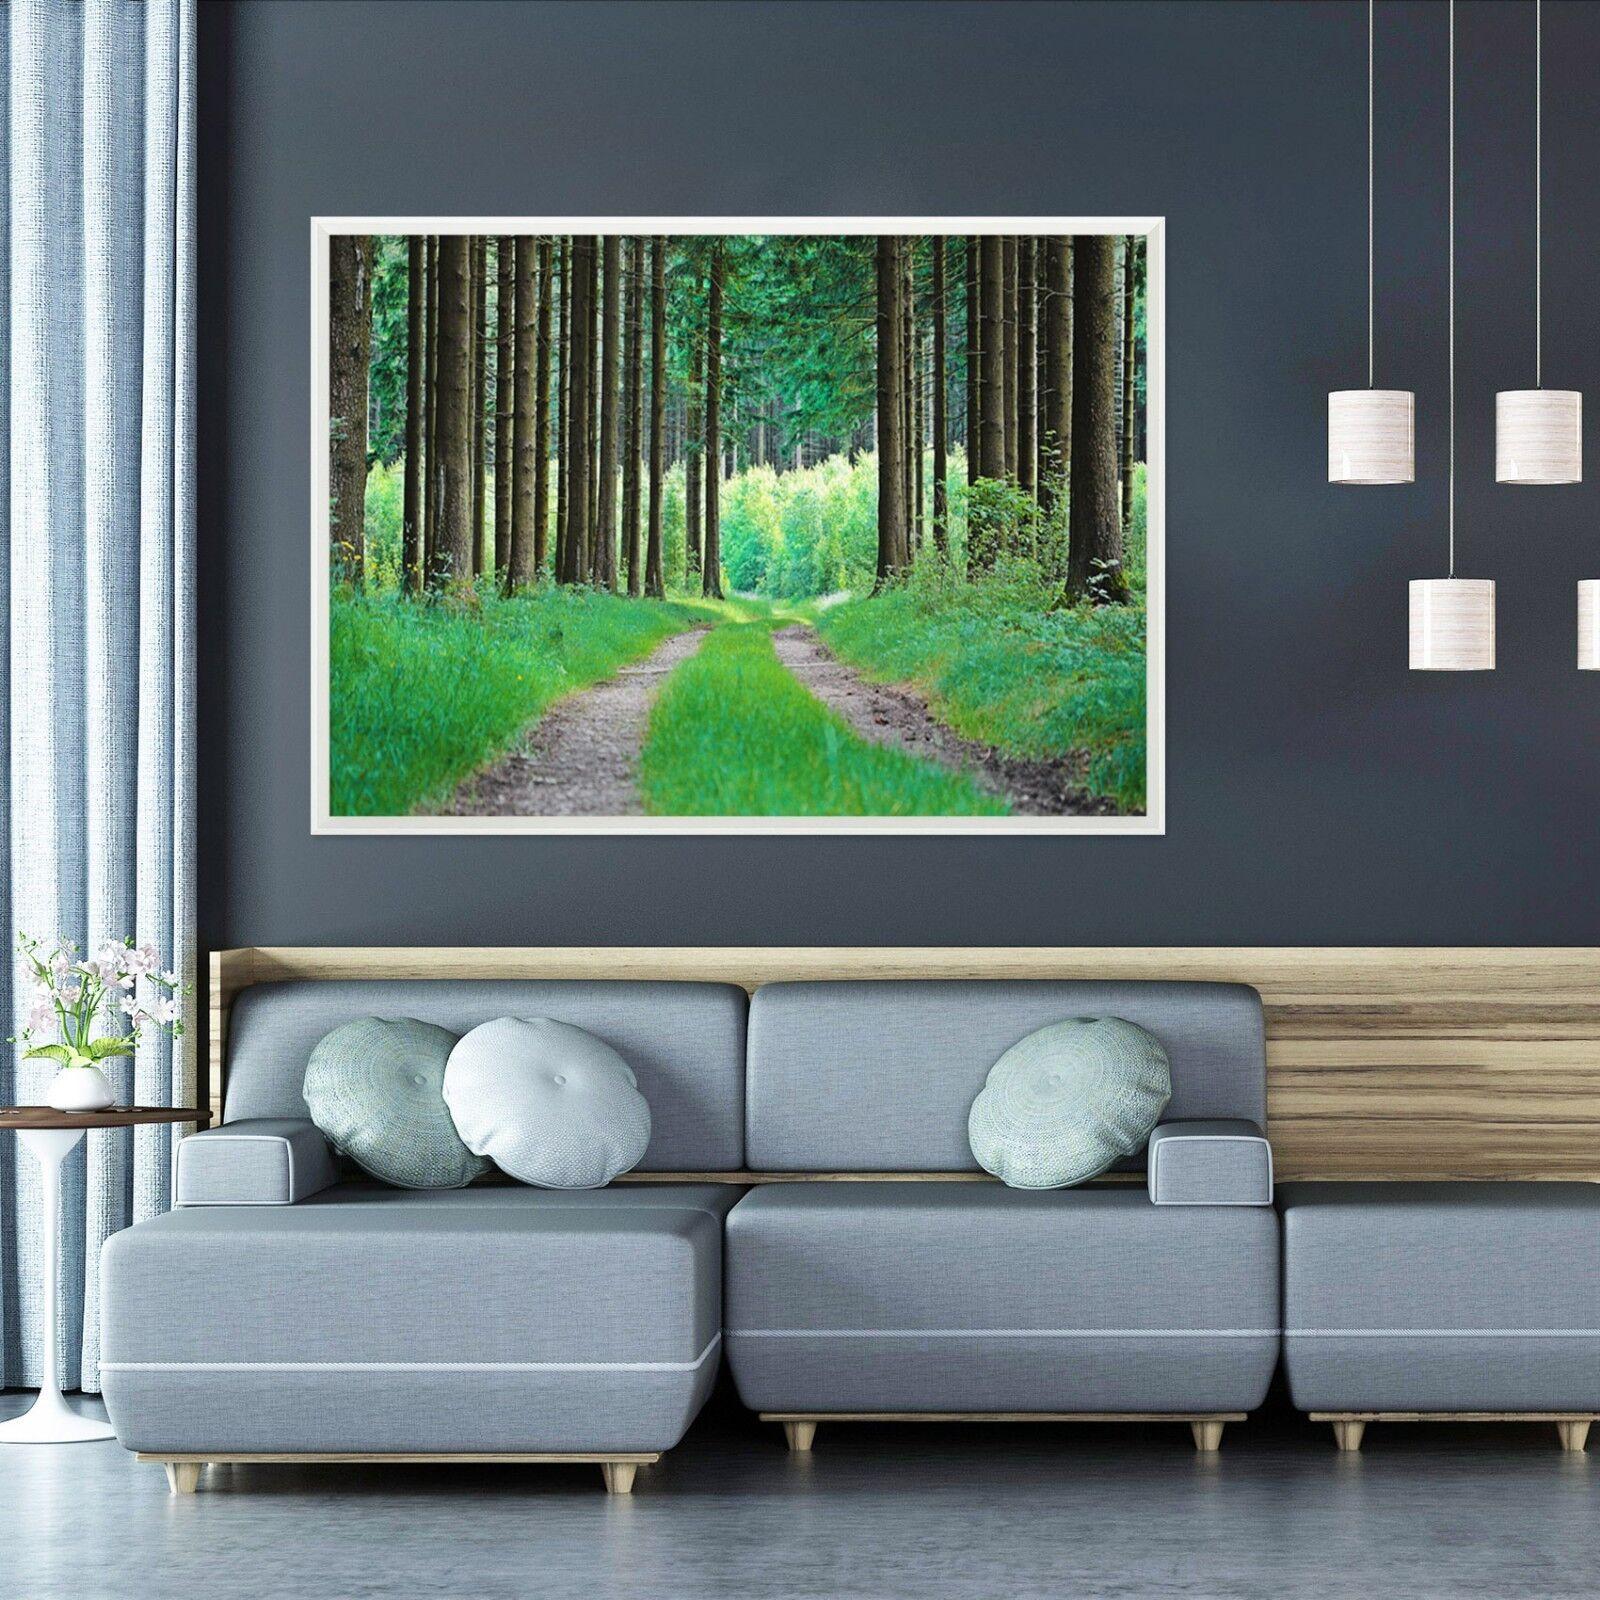 3D Small Road Woods 511 Framed Poster Home Decor Print Painting Art AJ WALLPAPER